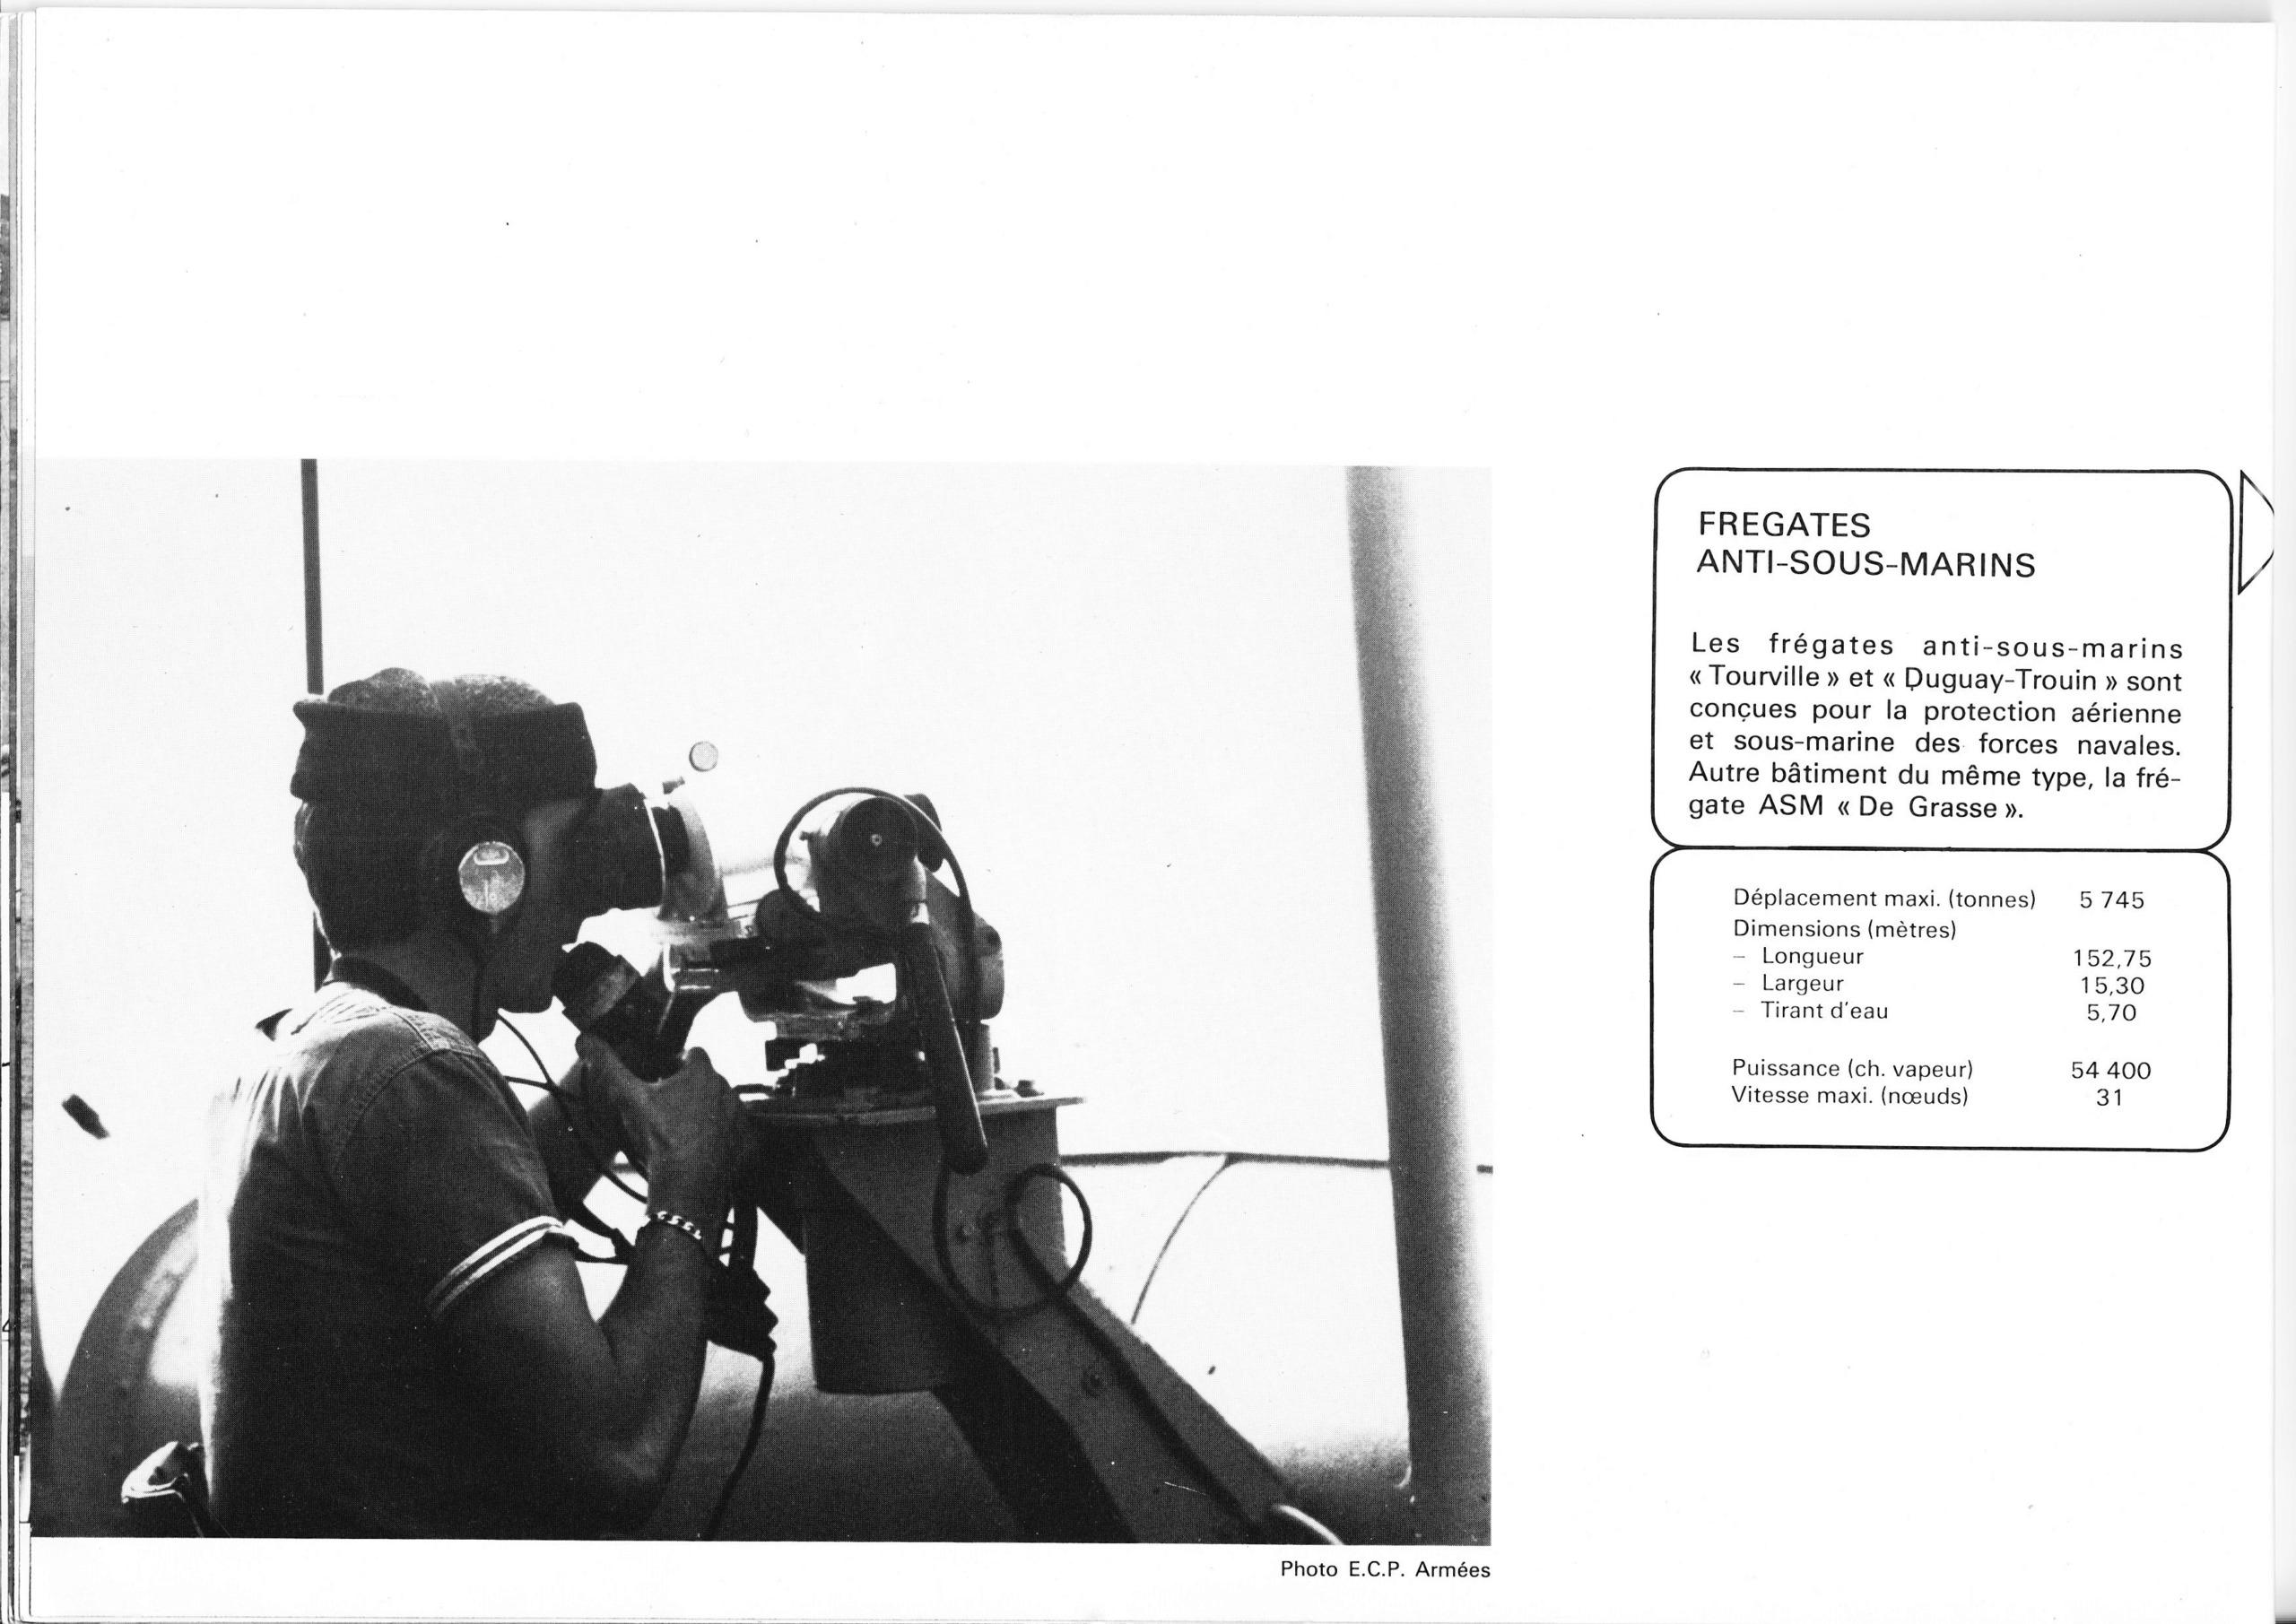 La marine de VGE - Page 2 Img_0037